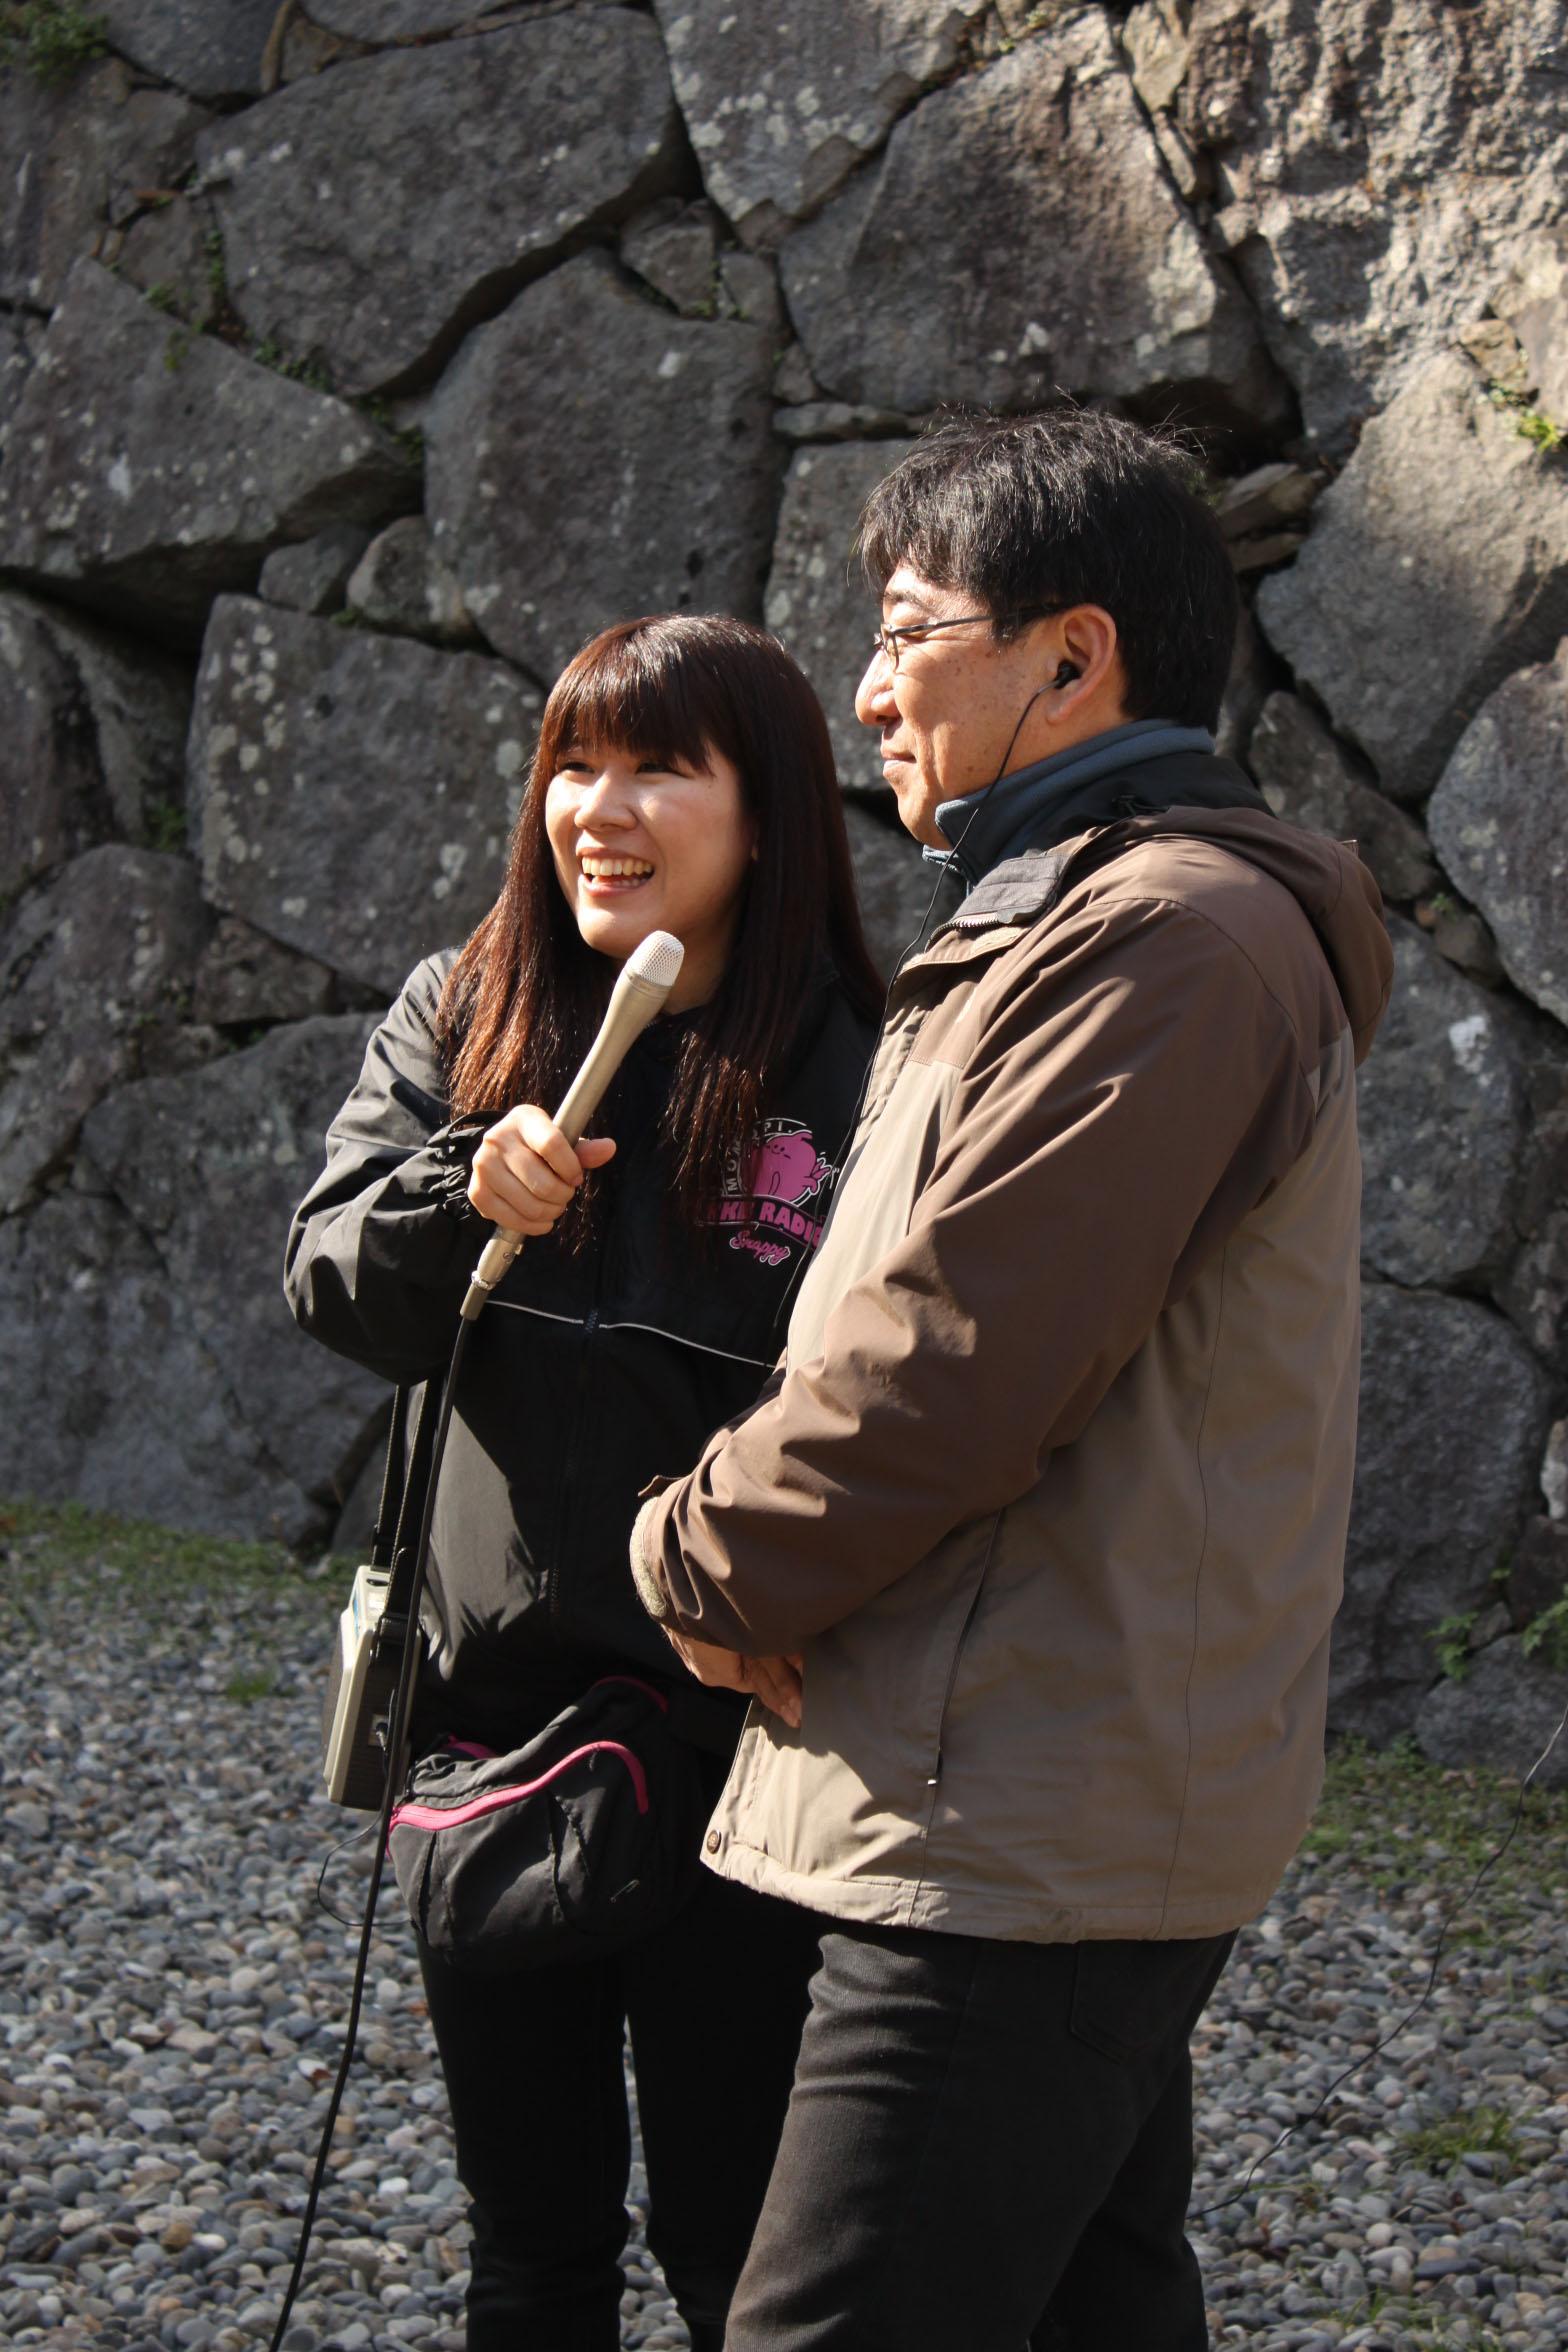 http://www.midorimachi.jp/blog/IMG_1866%E6%9D%BE%E9%9B%AA%E3%81%95%E3%82%93%E3%83%AA%E3%83%9D%E3%83%BC%E3%83%88.jpg